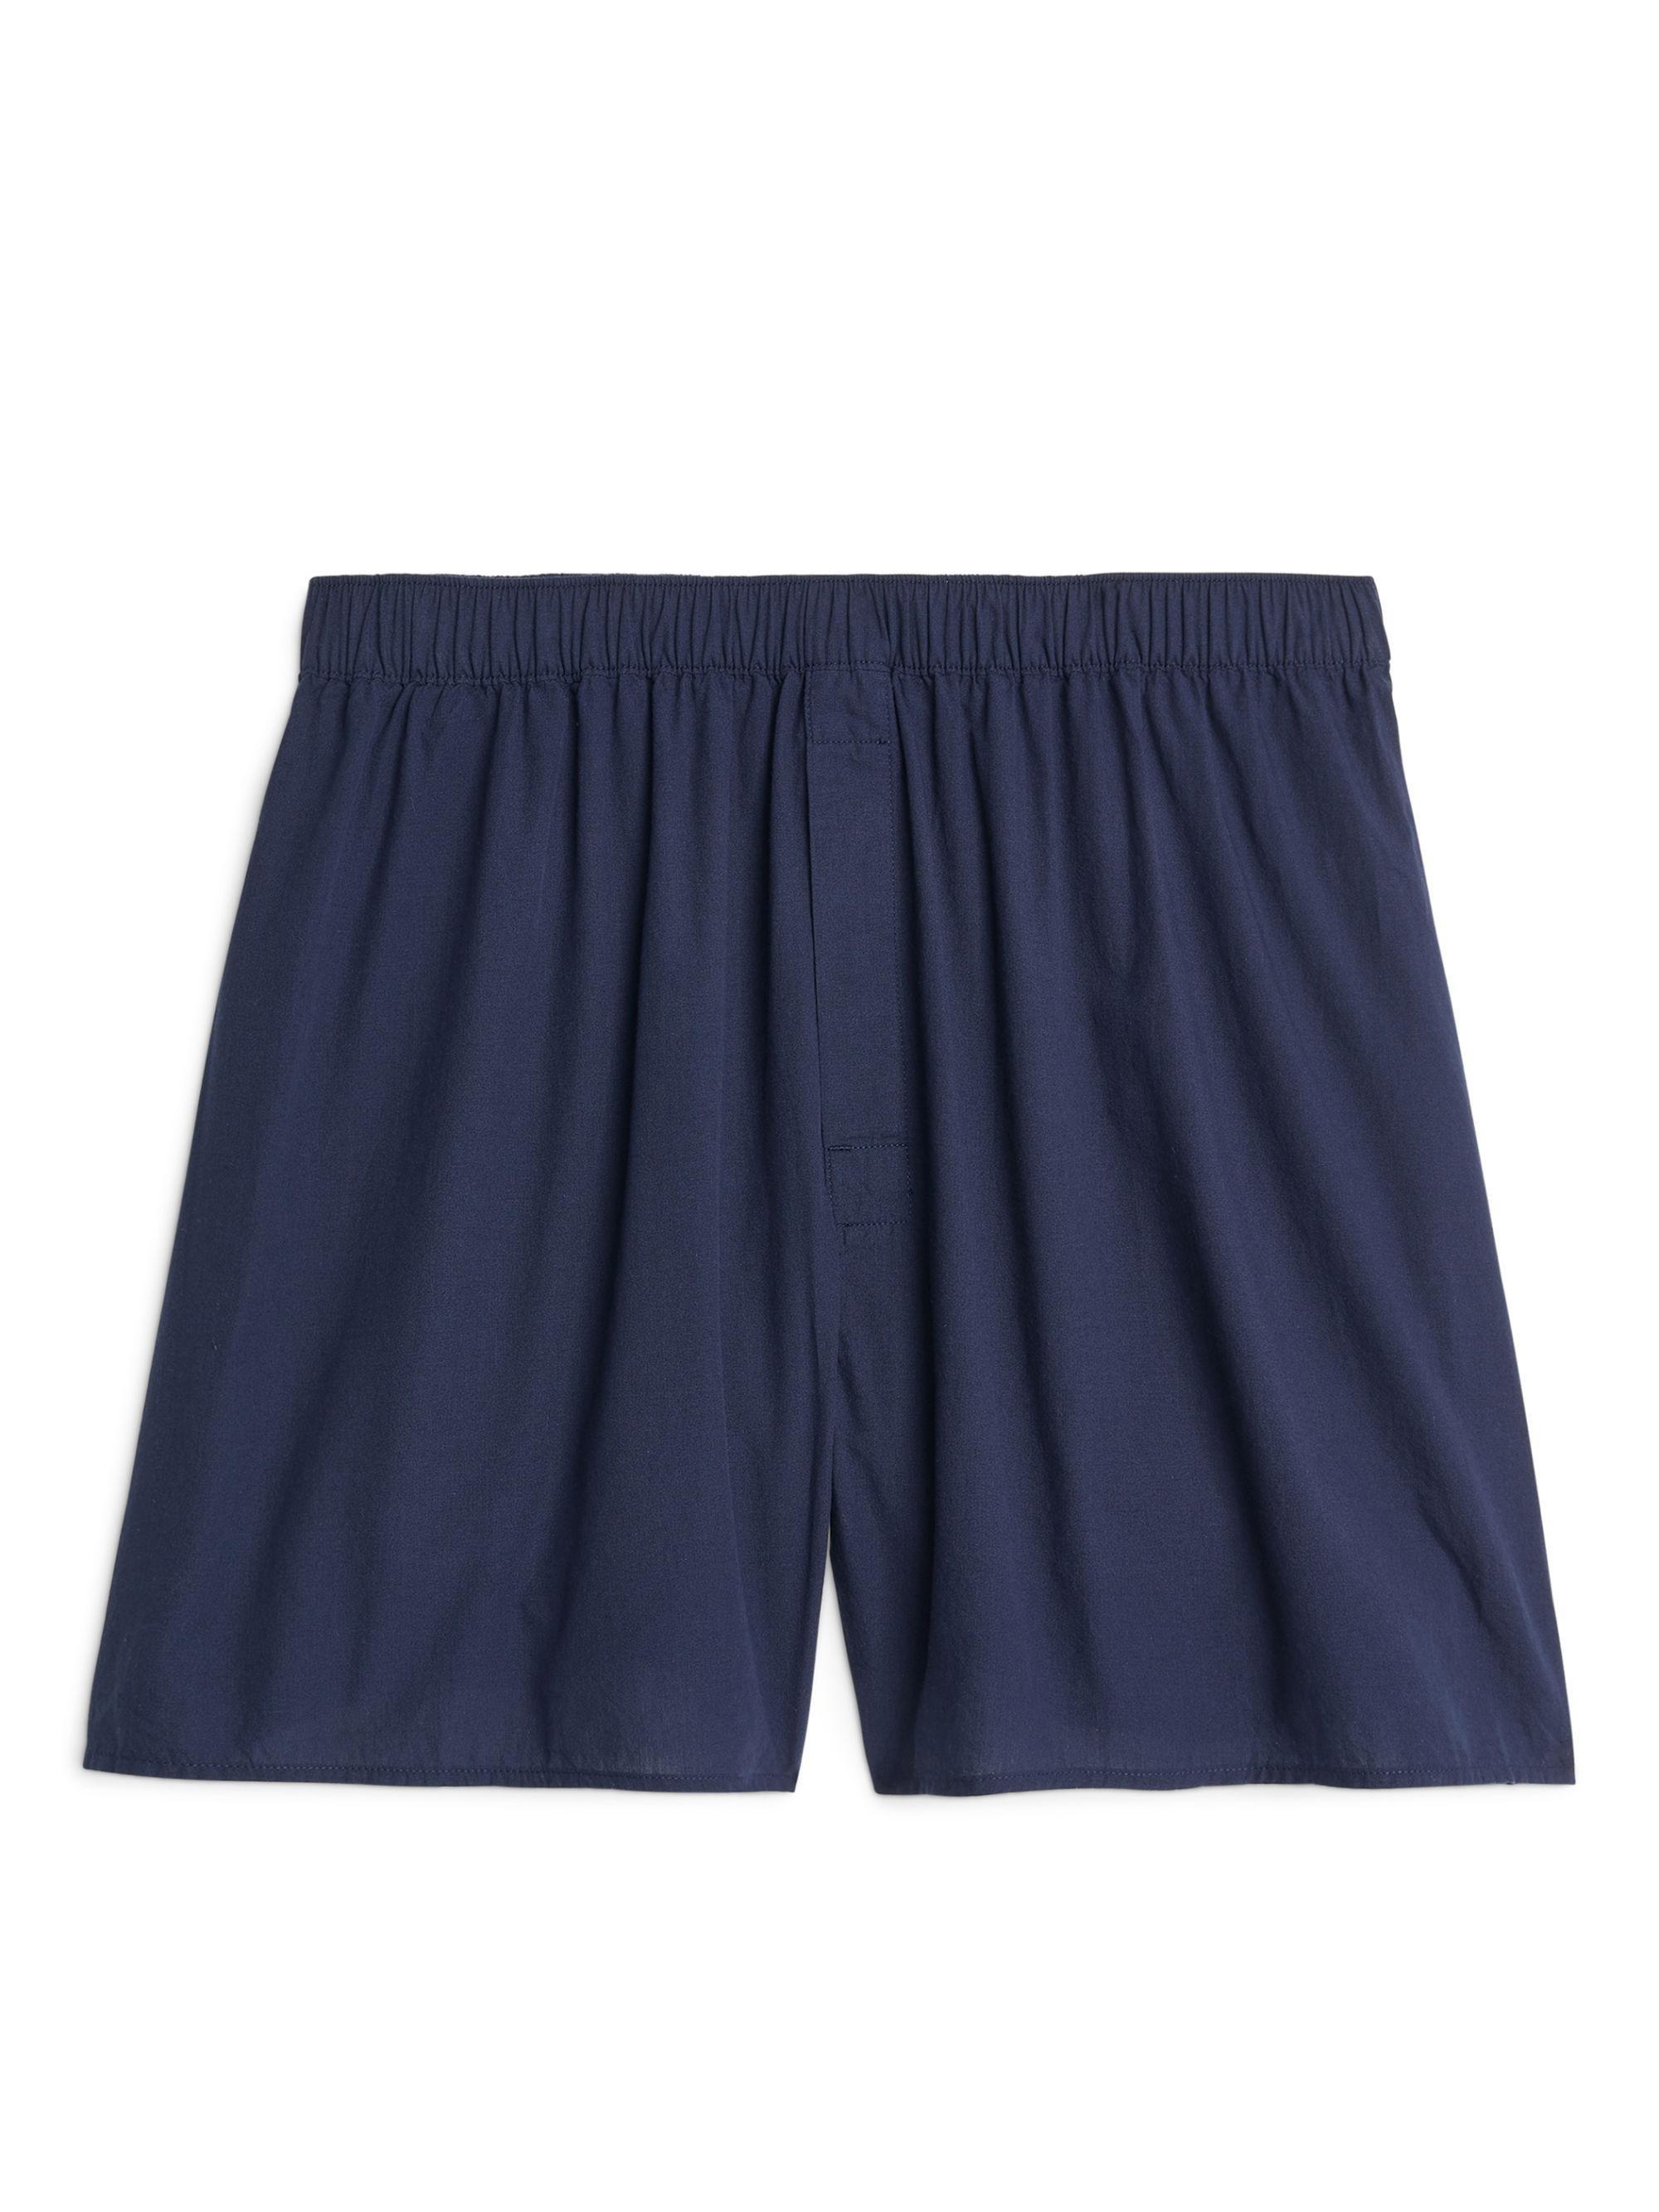 bc7a6e96ce ARKET Woven Cotton Boxer in Blue for Men - Lyst